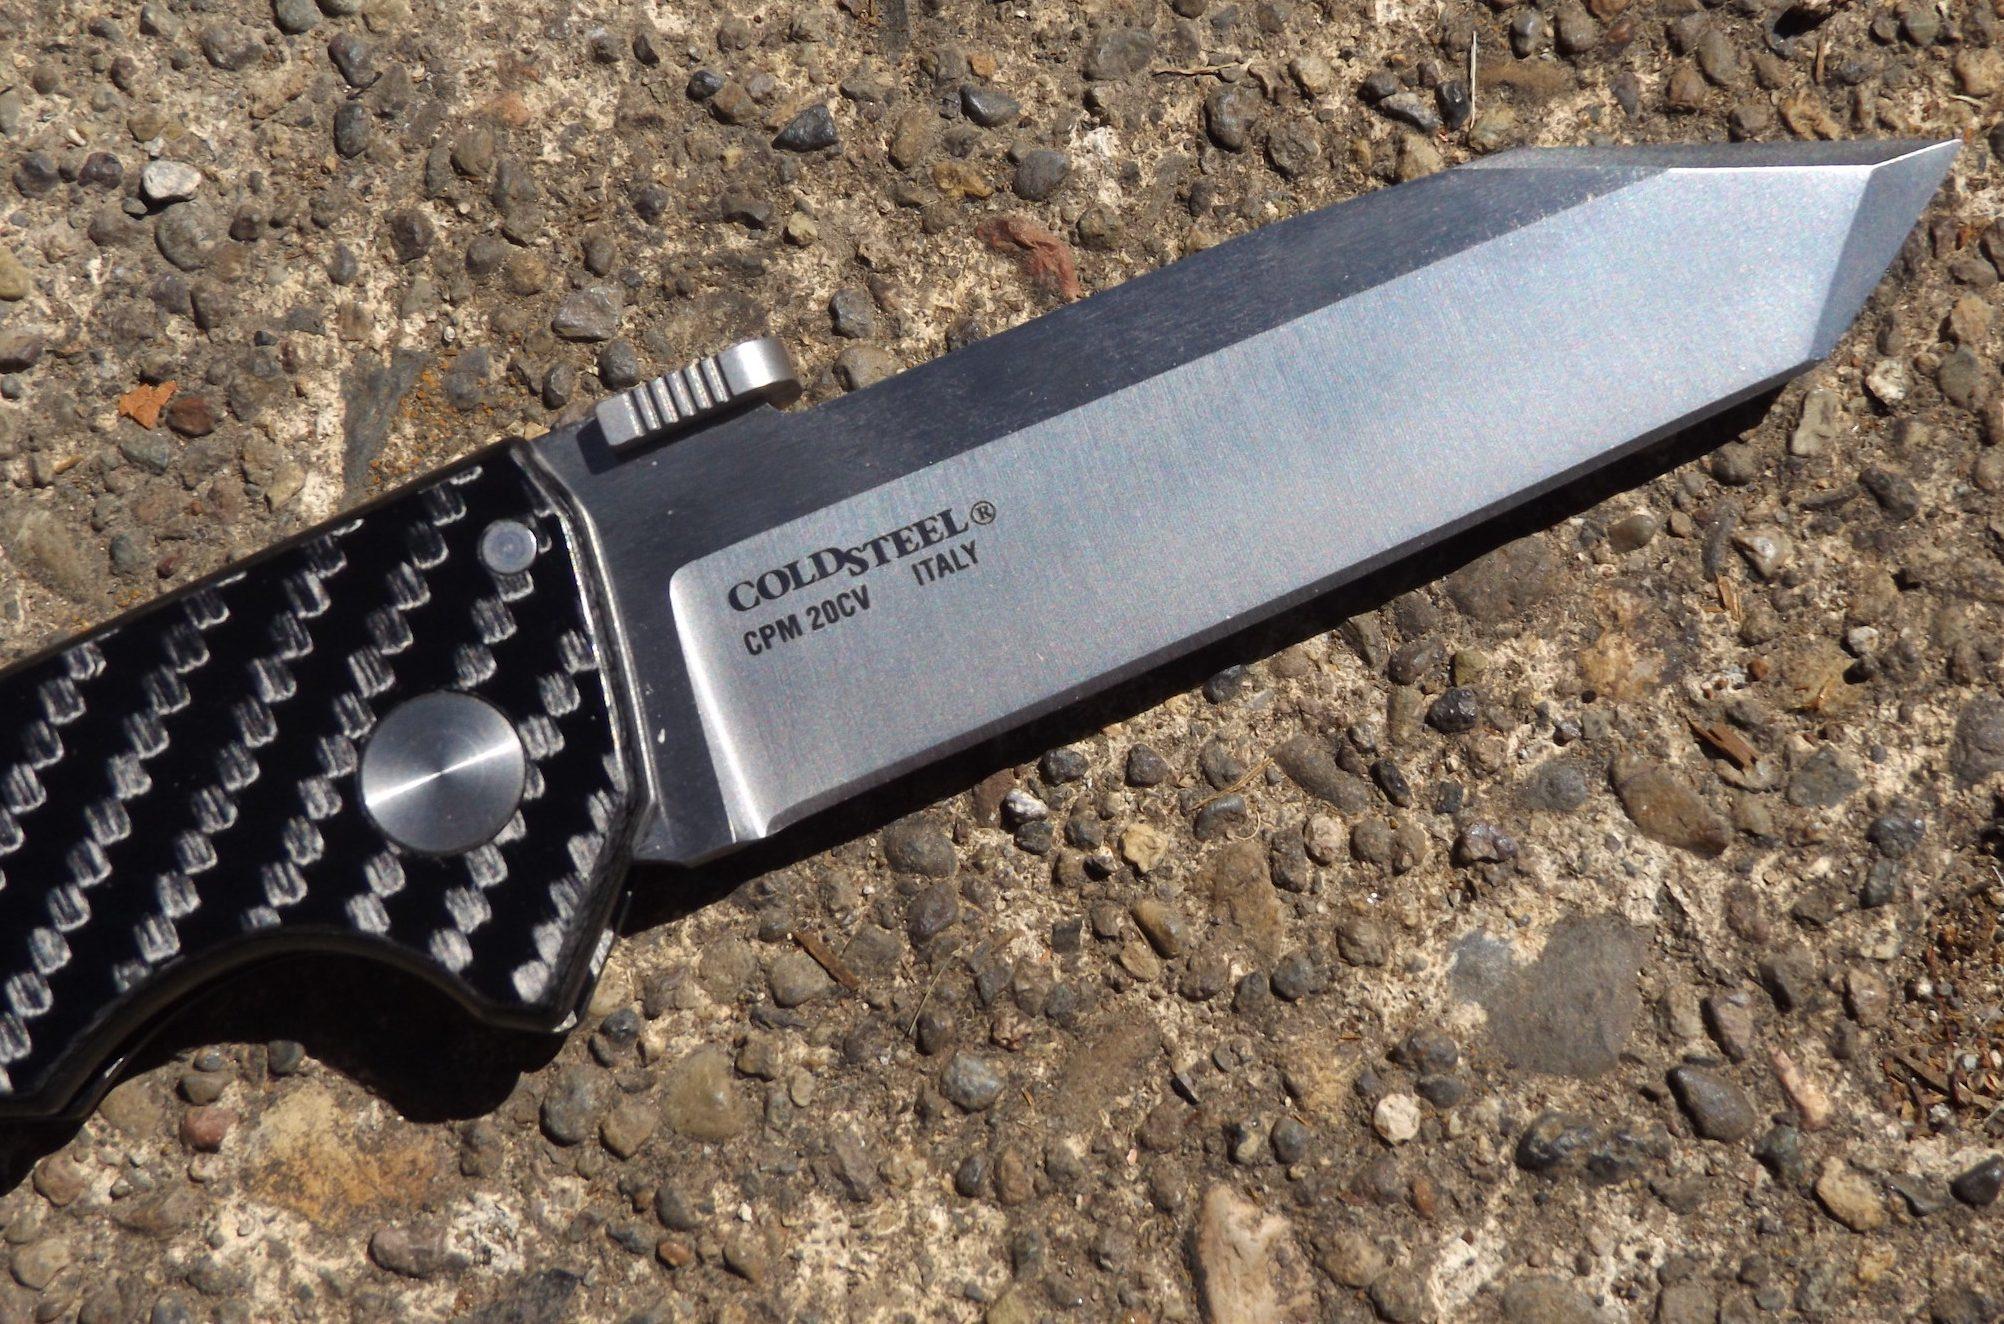 Фото 9 - Складной нож Storm Cloud, сталь CPM 20CV,  G-10/карбон от Cold Steel